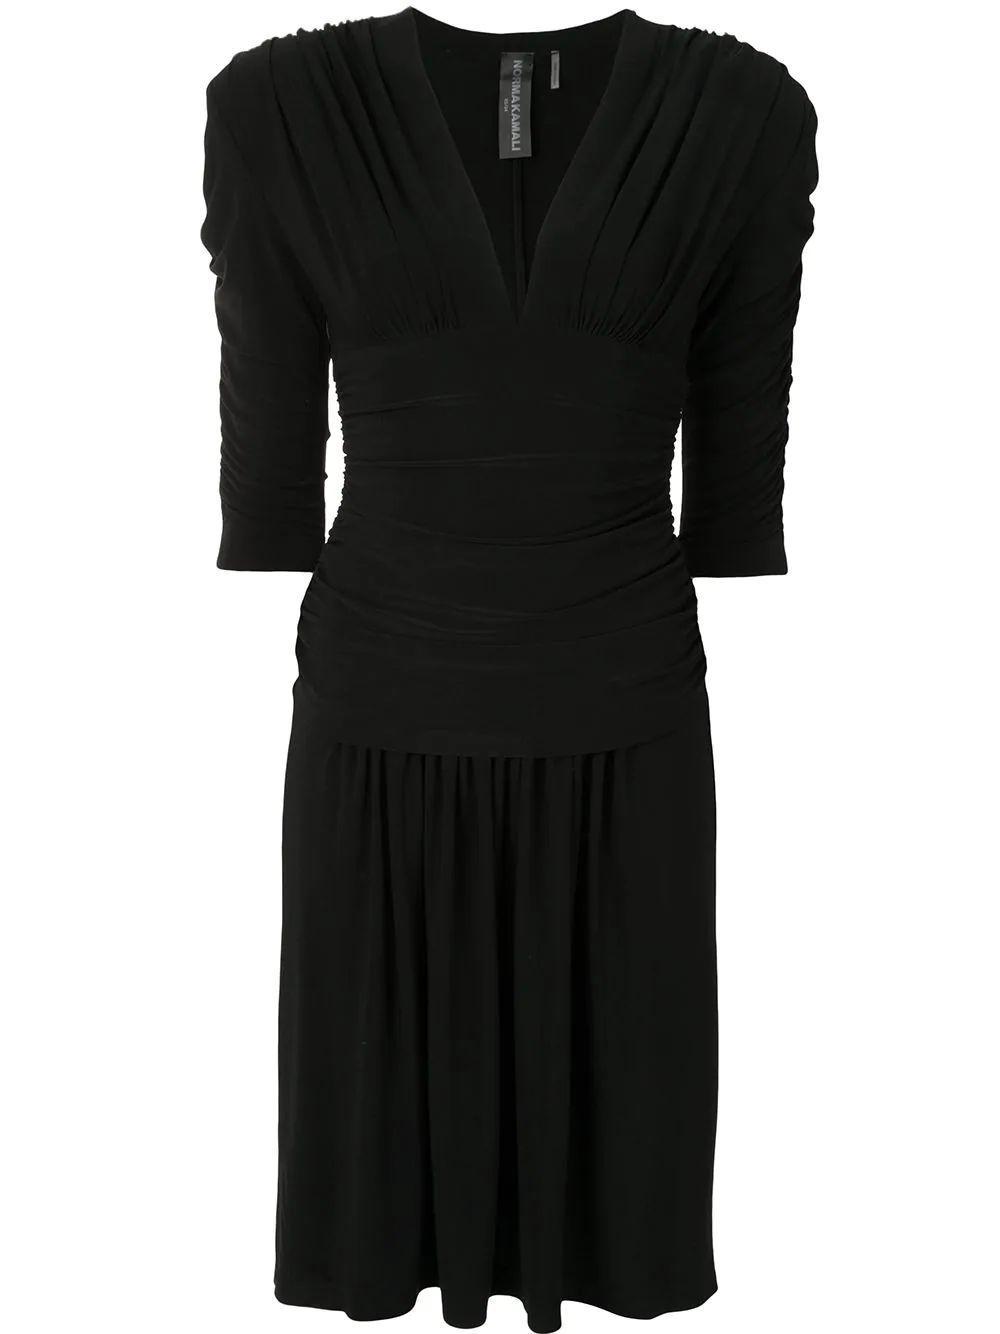 Shirred Sleeve Dress Item # KK3203PL199001